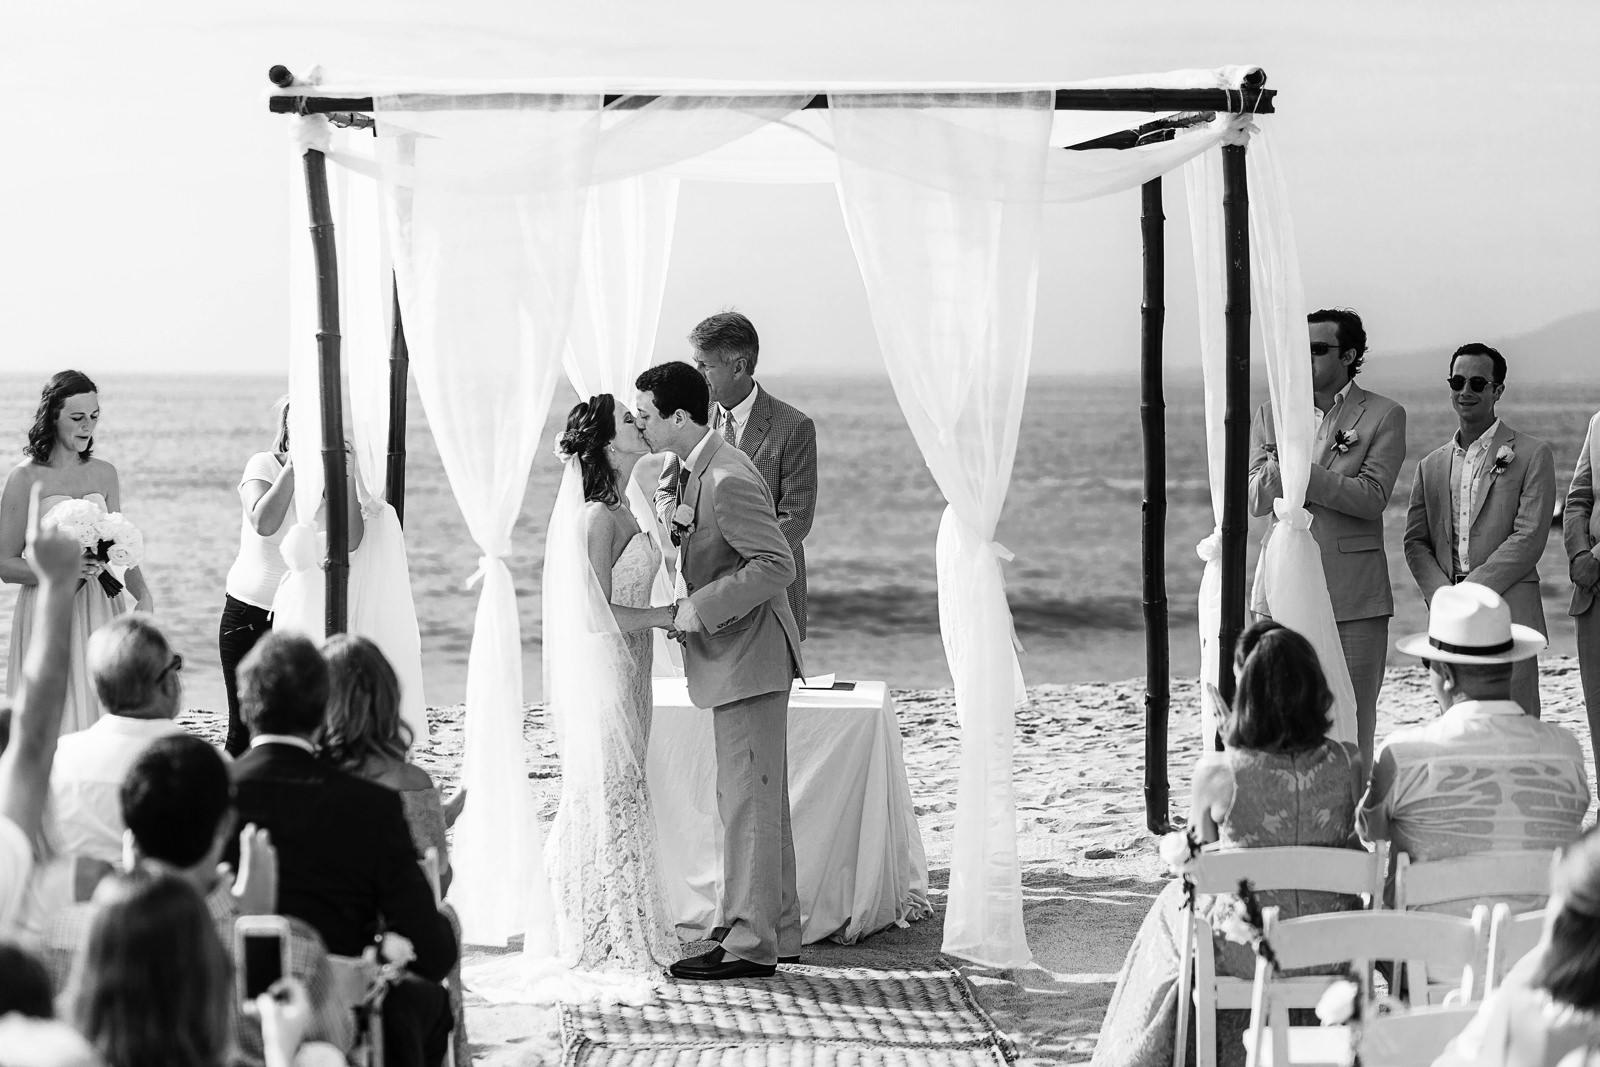 Kiss at wedding ceremony on the beach - Eder Acevedo cancun los cabos vallarta wedding photographer